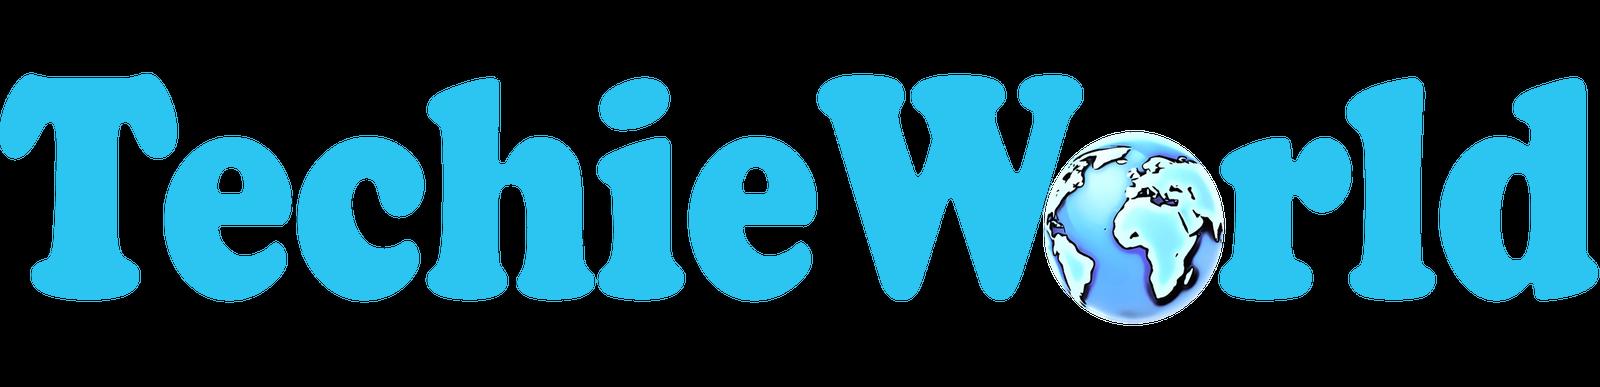 techieworldau